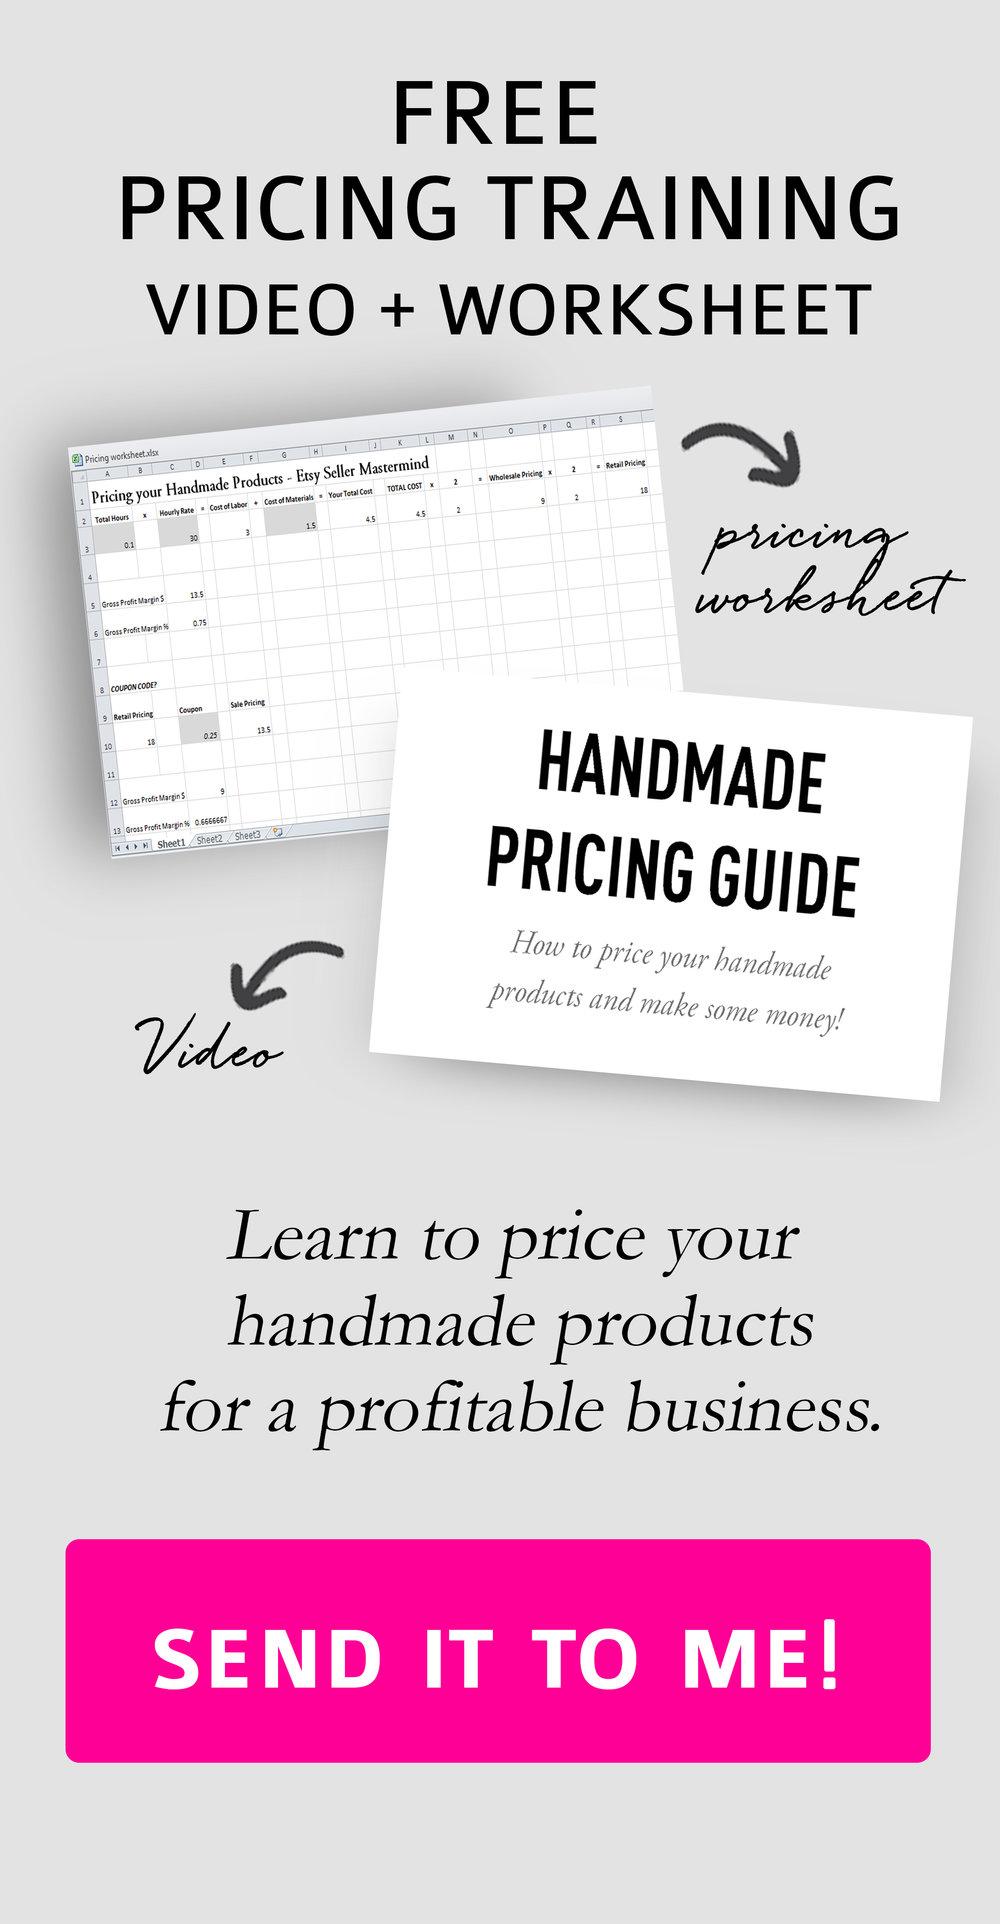 freepricingwebinar.jpg